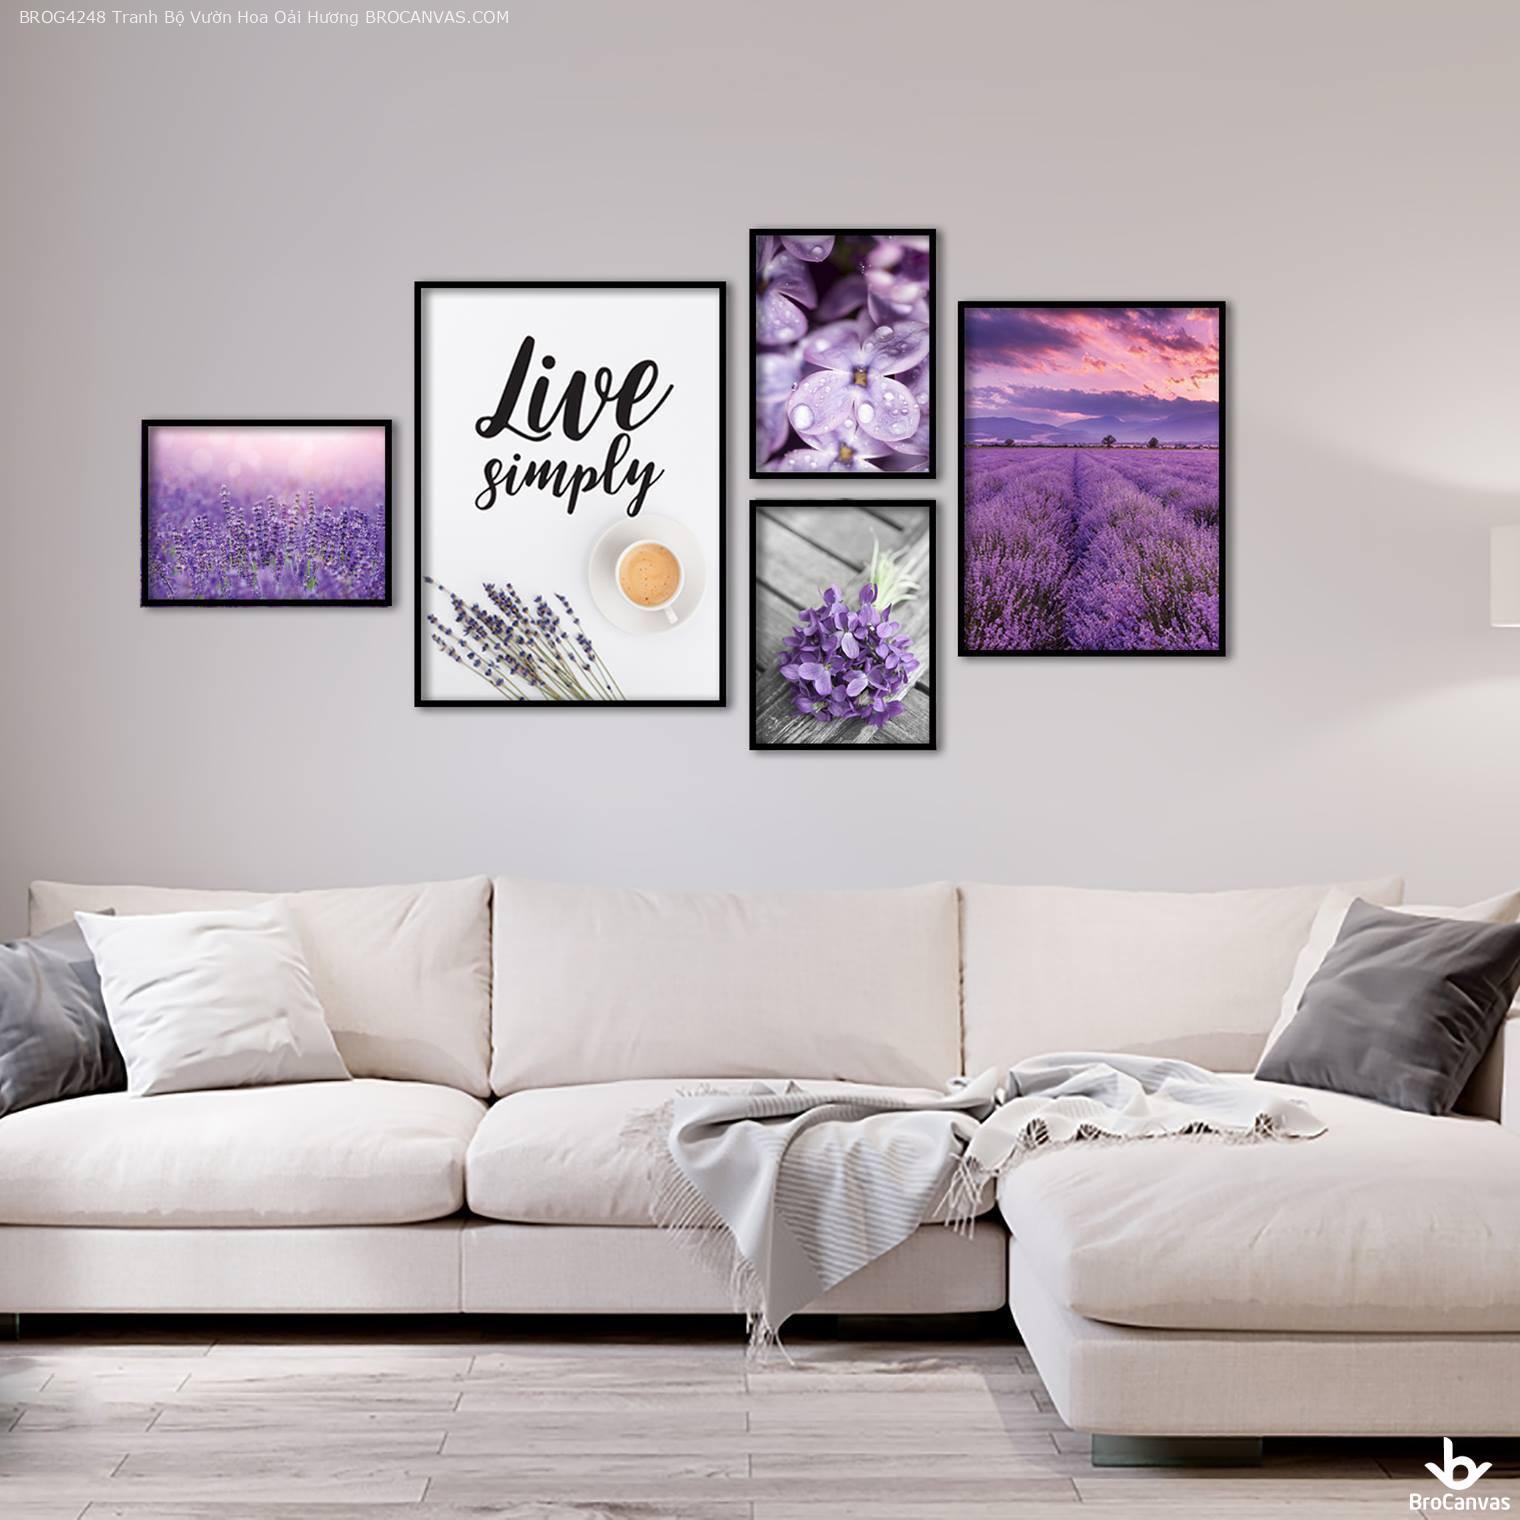 Tranh vườn hoa oải hương